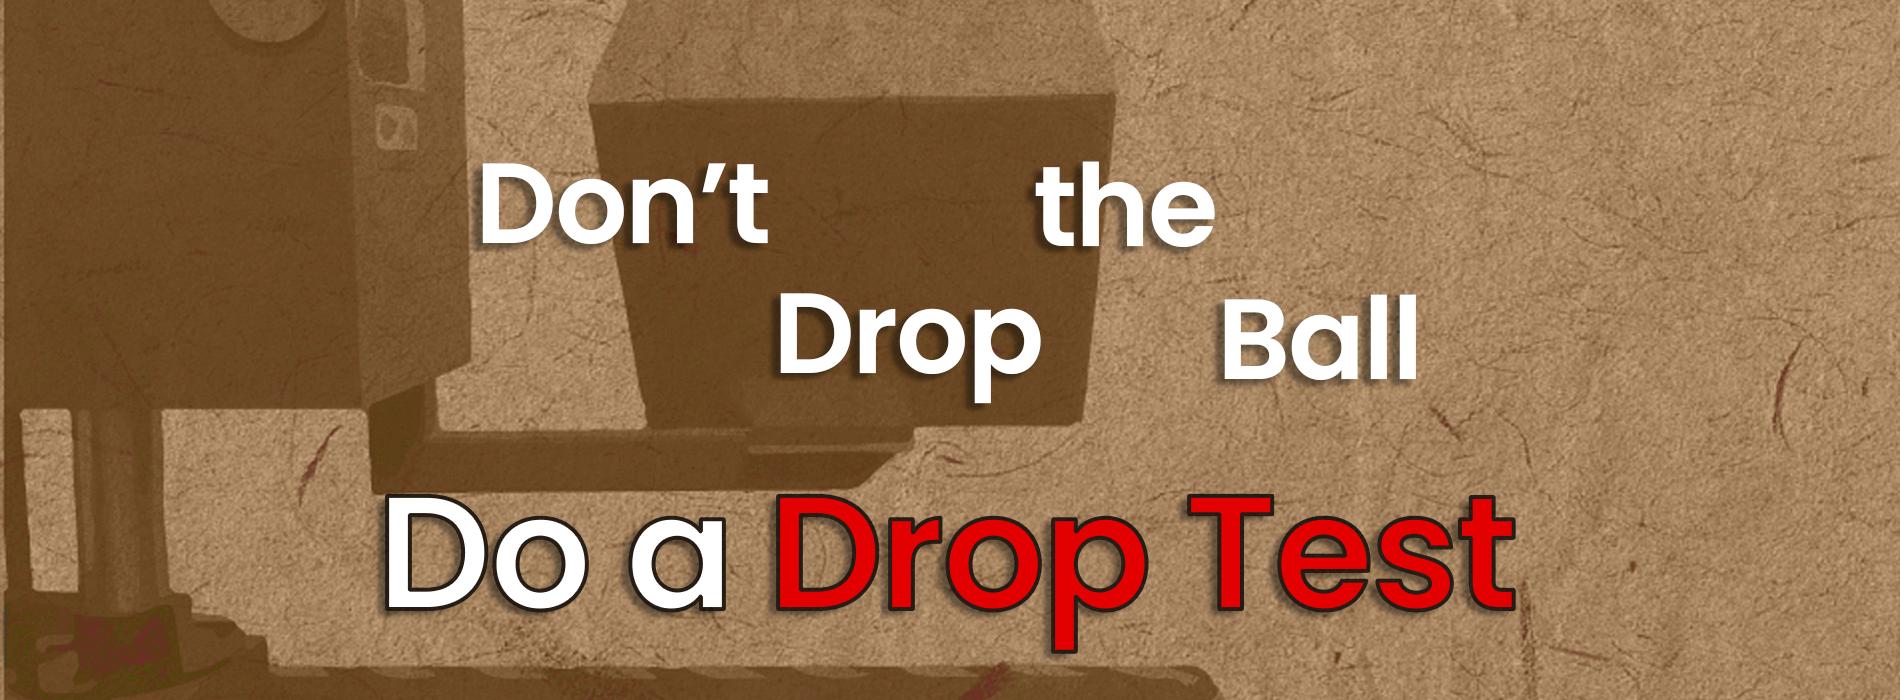 ARL: Don't Drop the Ball, Do a Drop Test Header Image